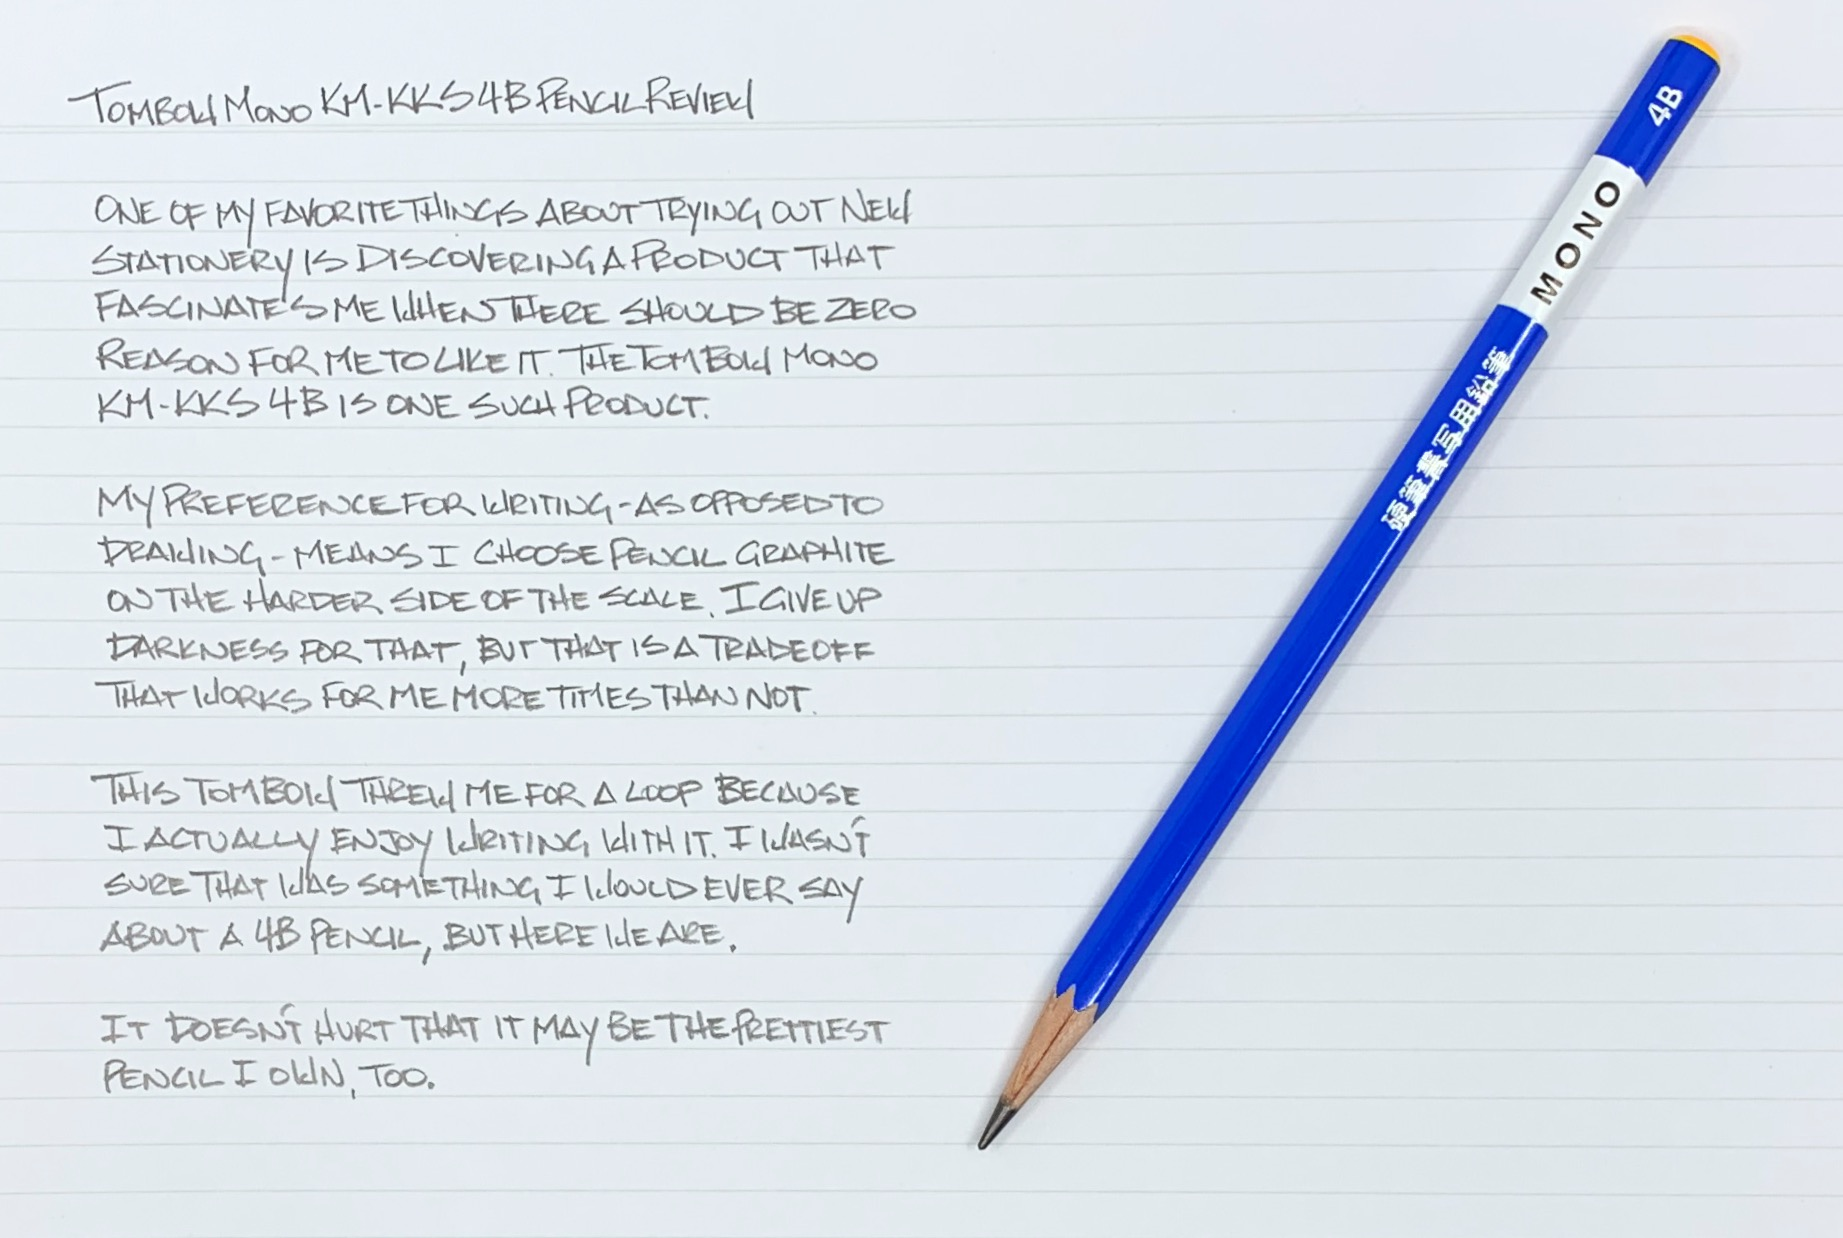 Tombow Mono KM-KKS 4B Pencil Writing Sample